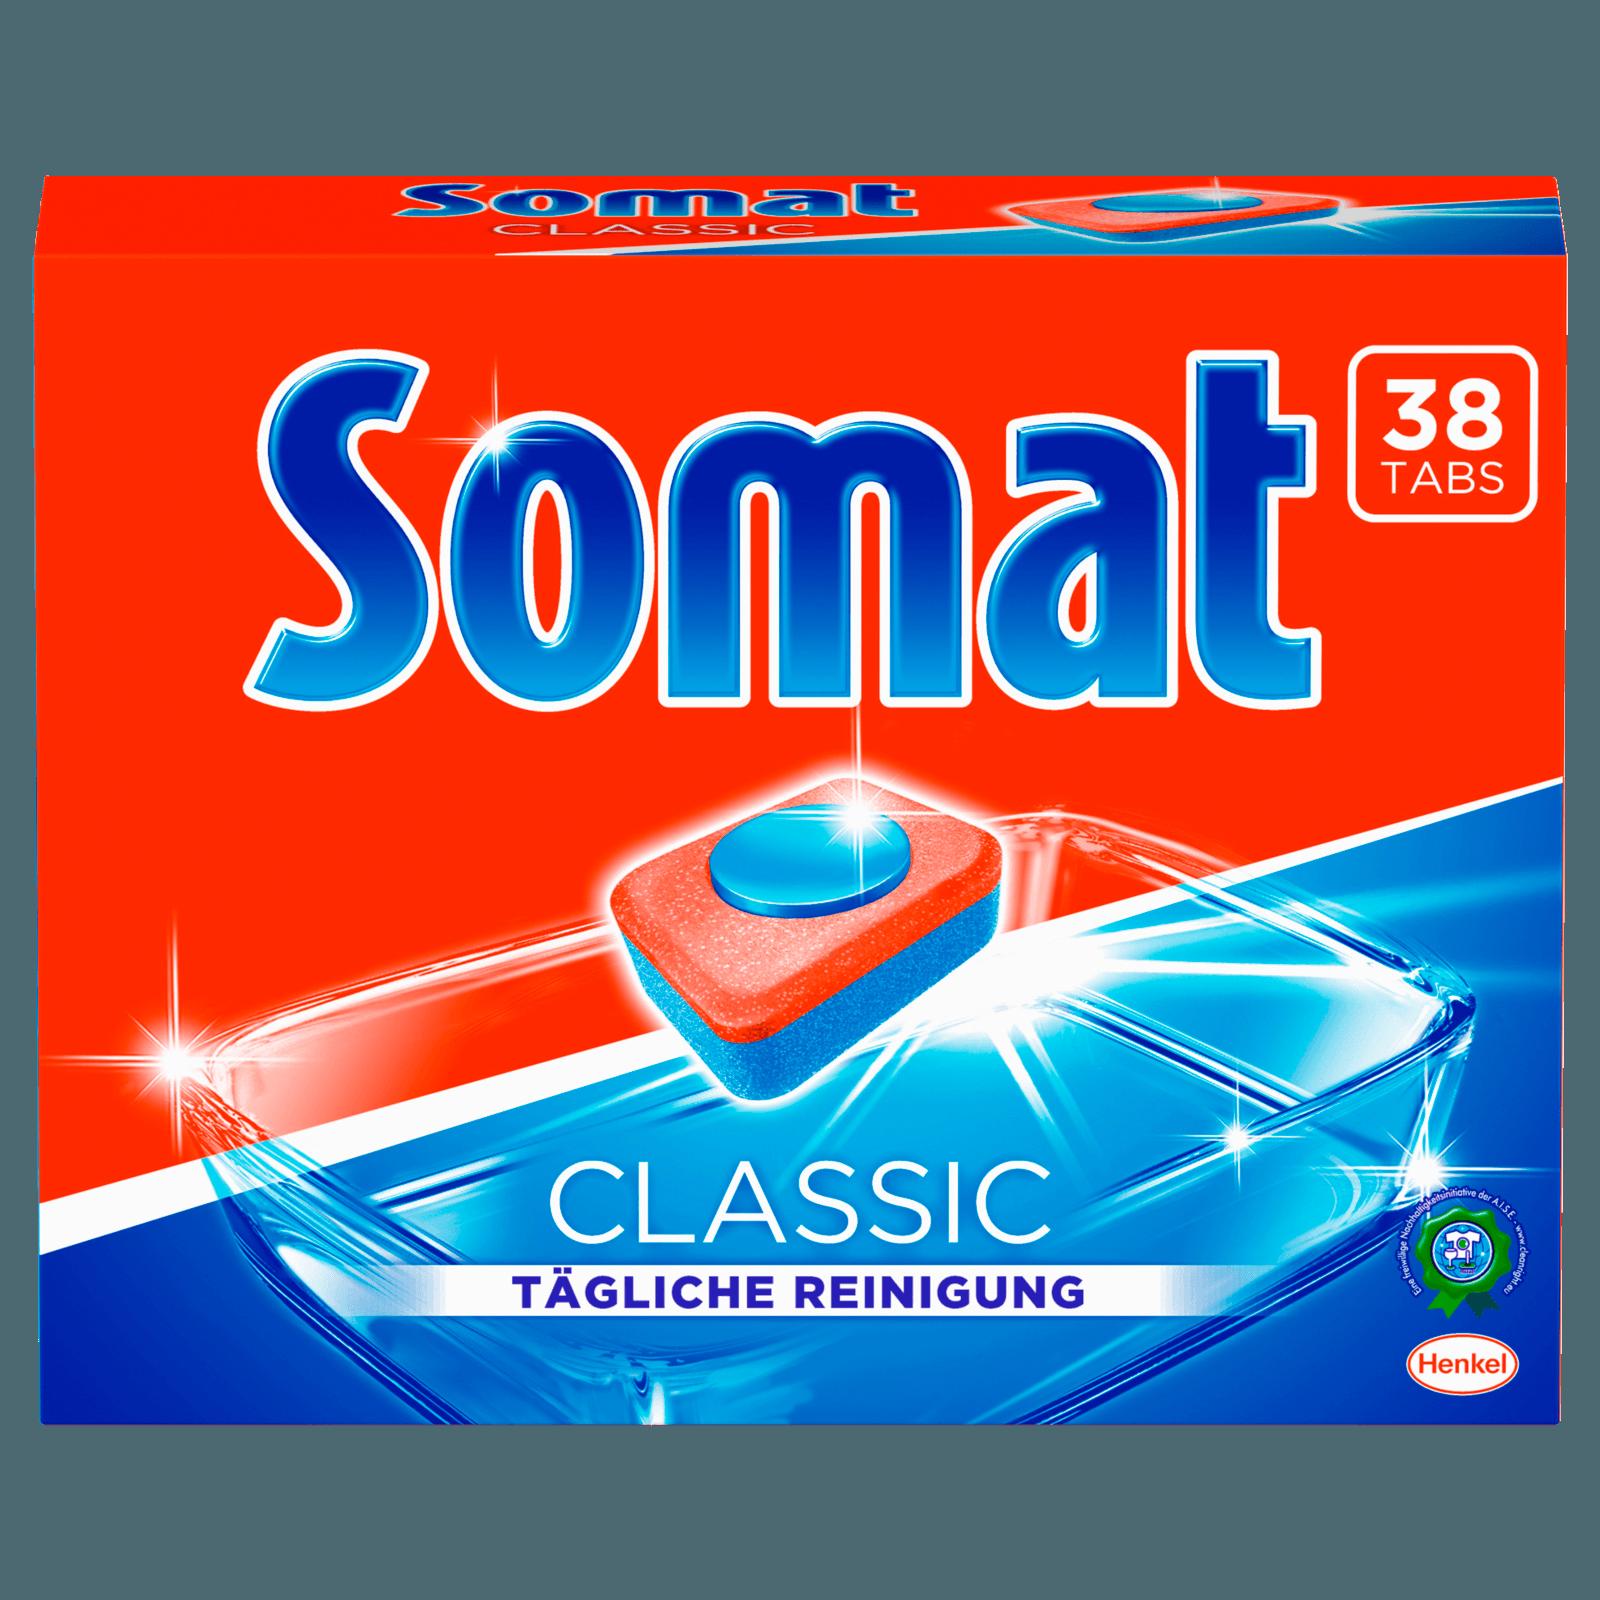 Somat Classic 665g, 38 Tabs